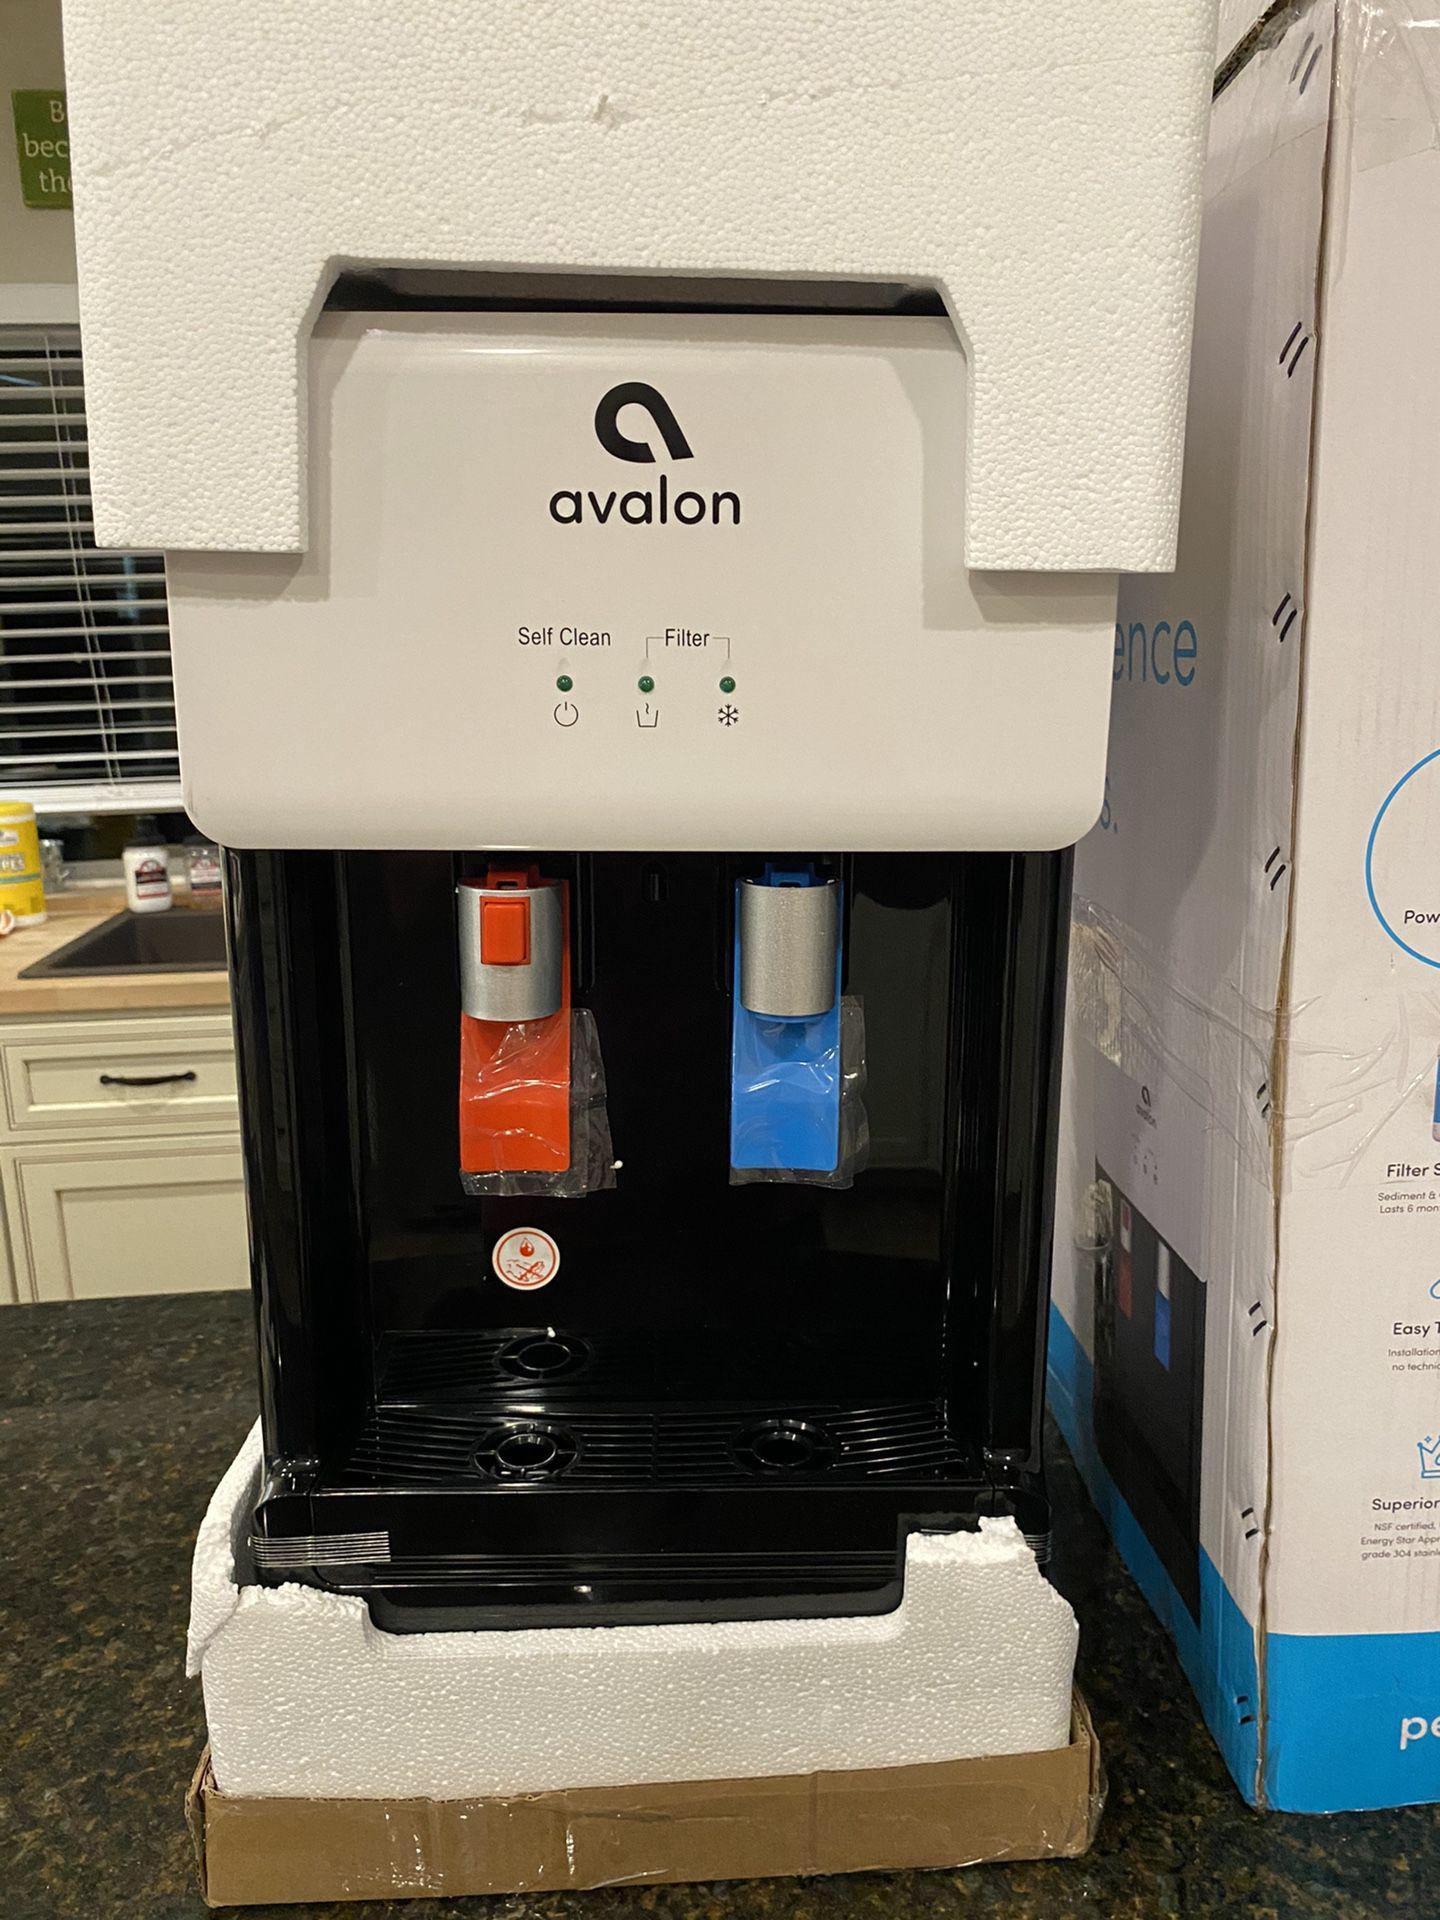 Avalon A8CTBOTTLELESSWHT Countertop Self Cleaning Touchless Bottleless Cooler Dispen...